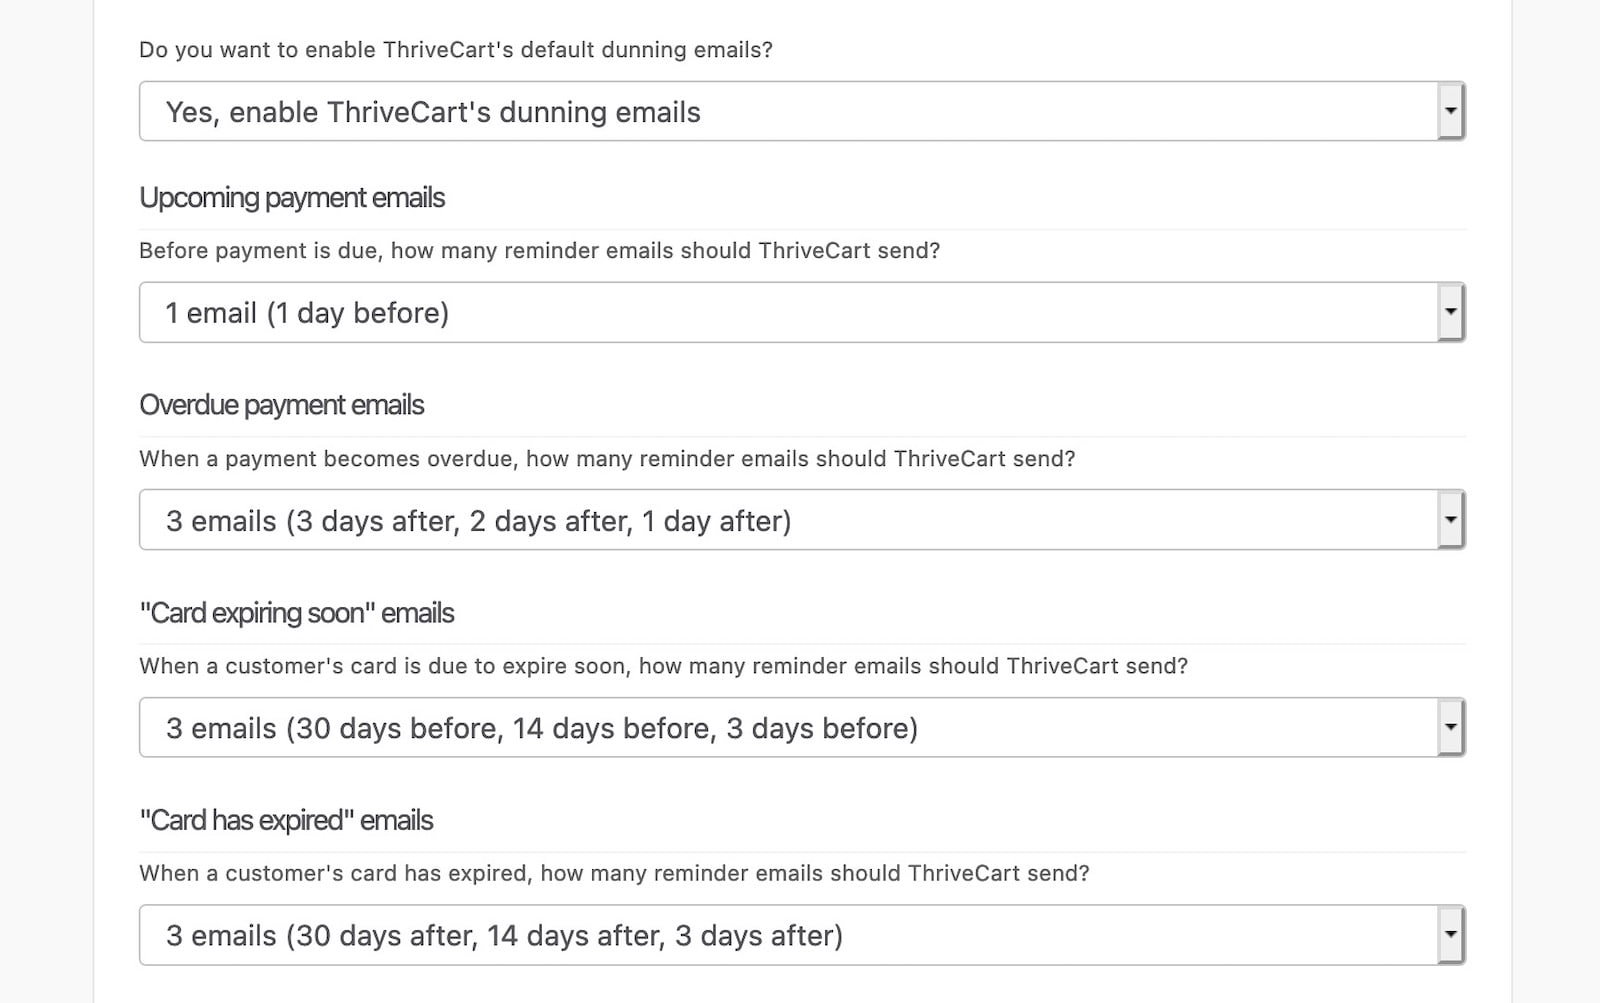 ThriveCart dunning options